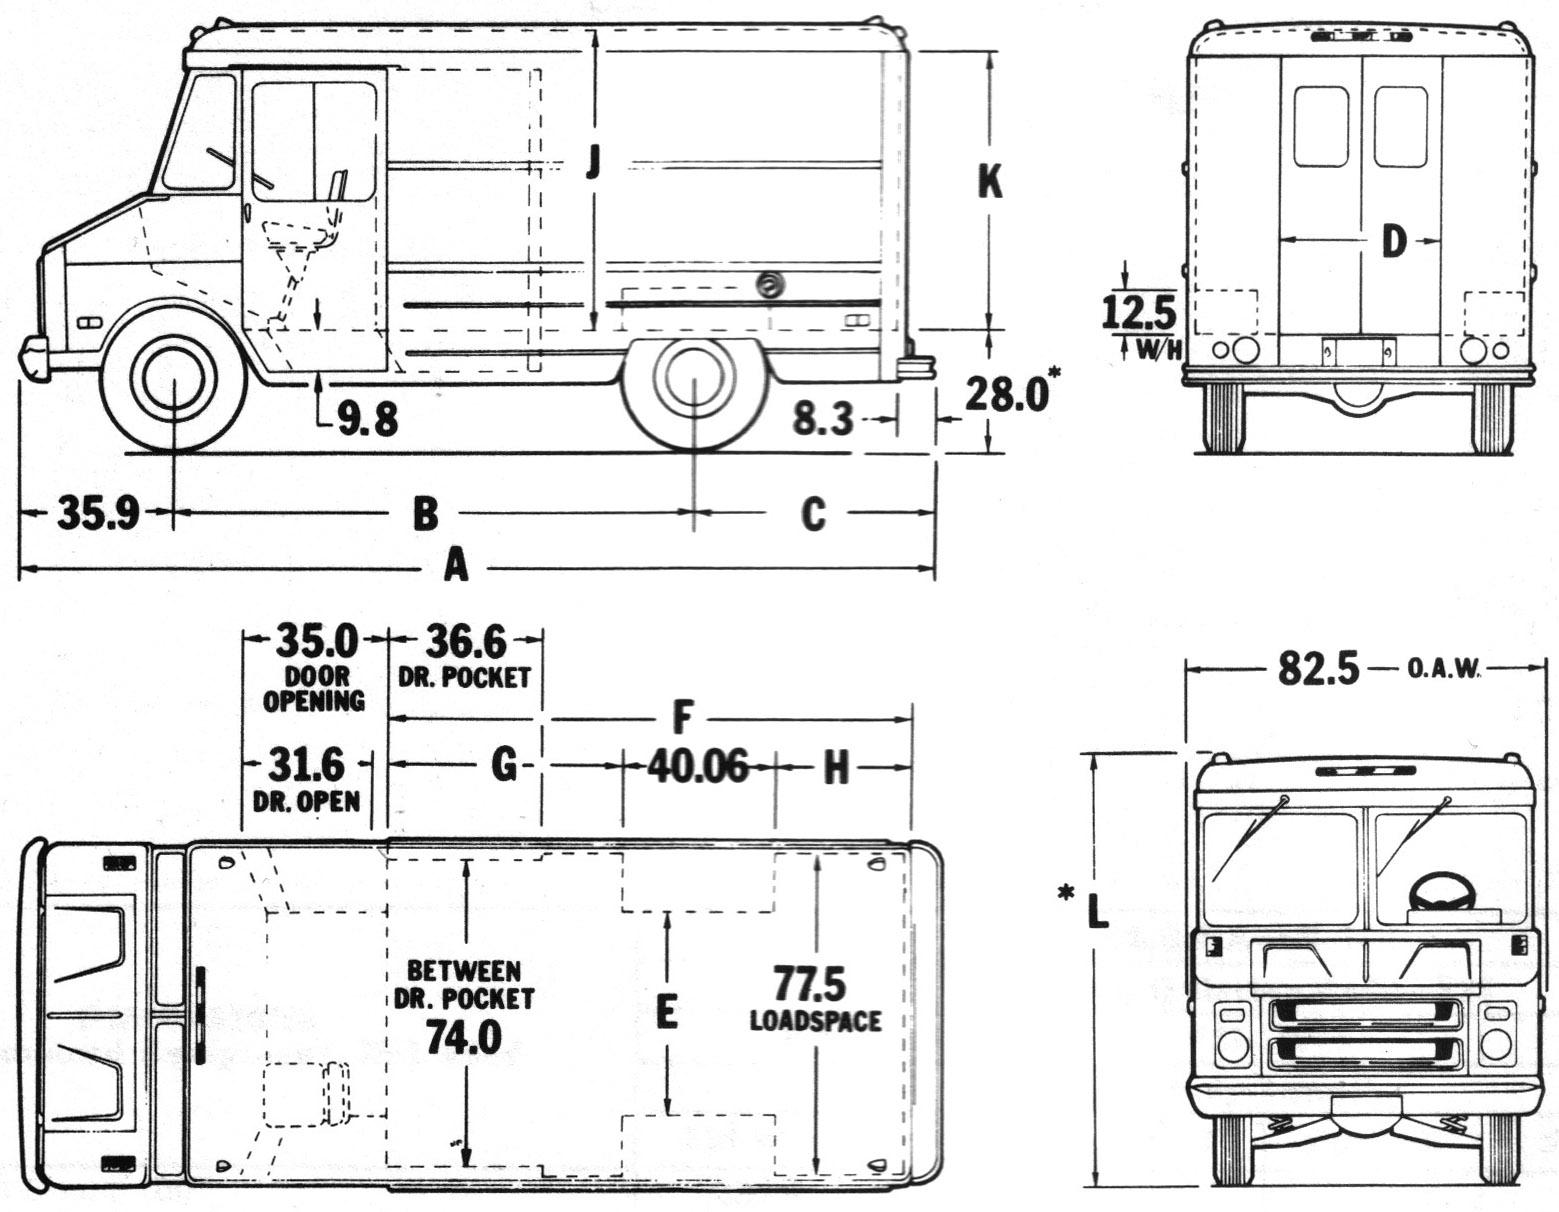 Chevrolet c30 blueprint download free blueprint for 3d modeling chevrolet c30 blueprint malvernweather Gallery